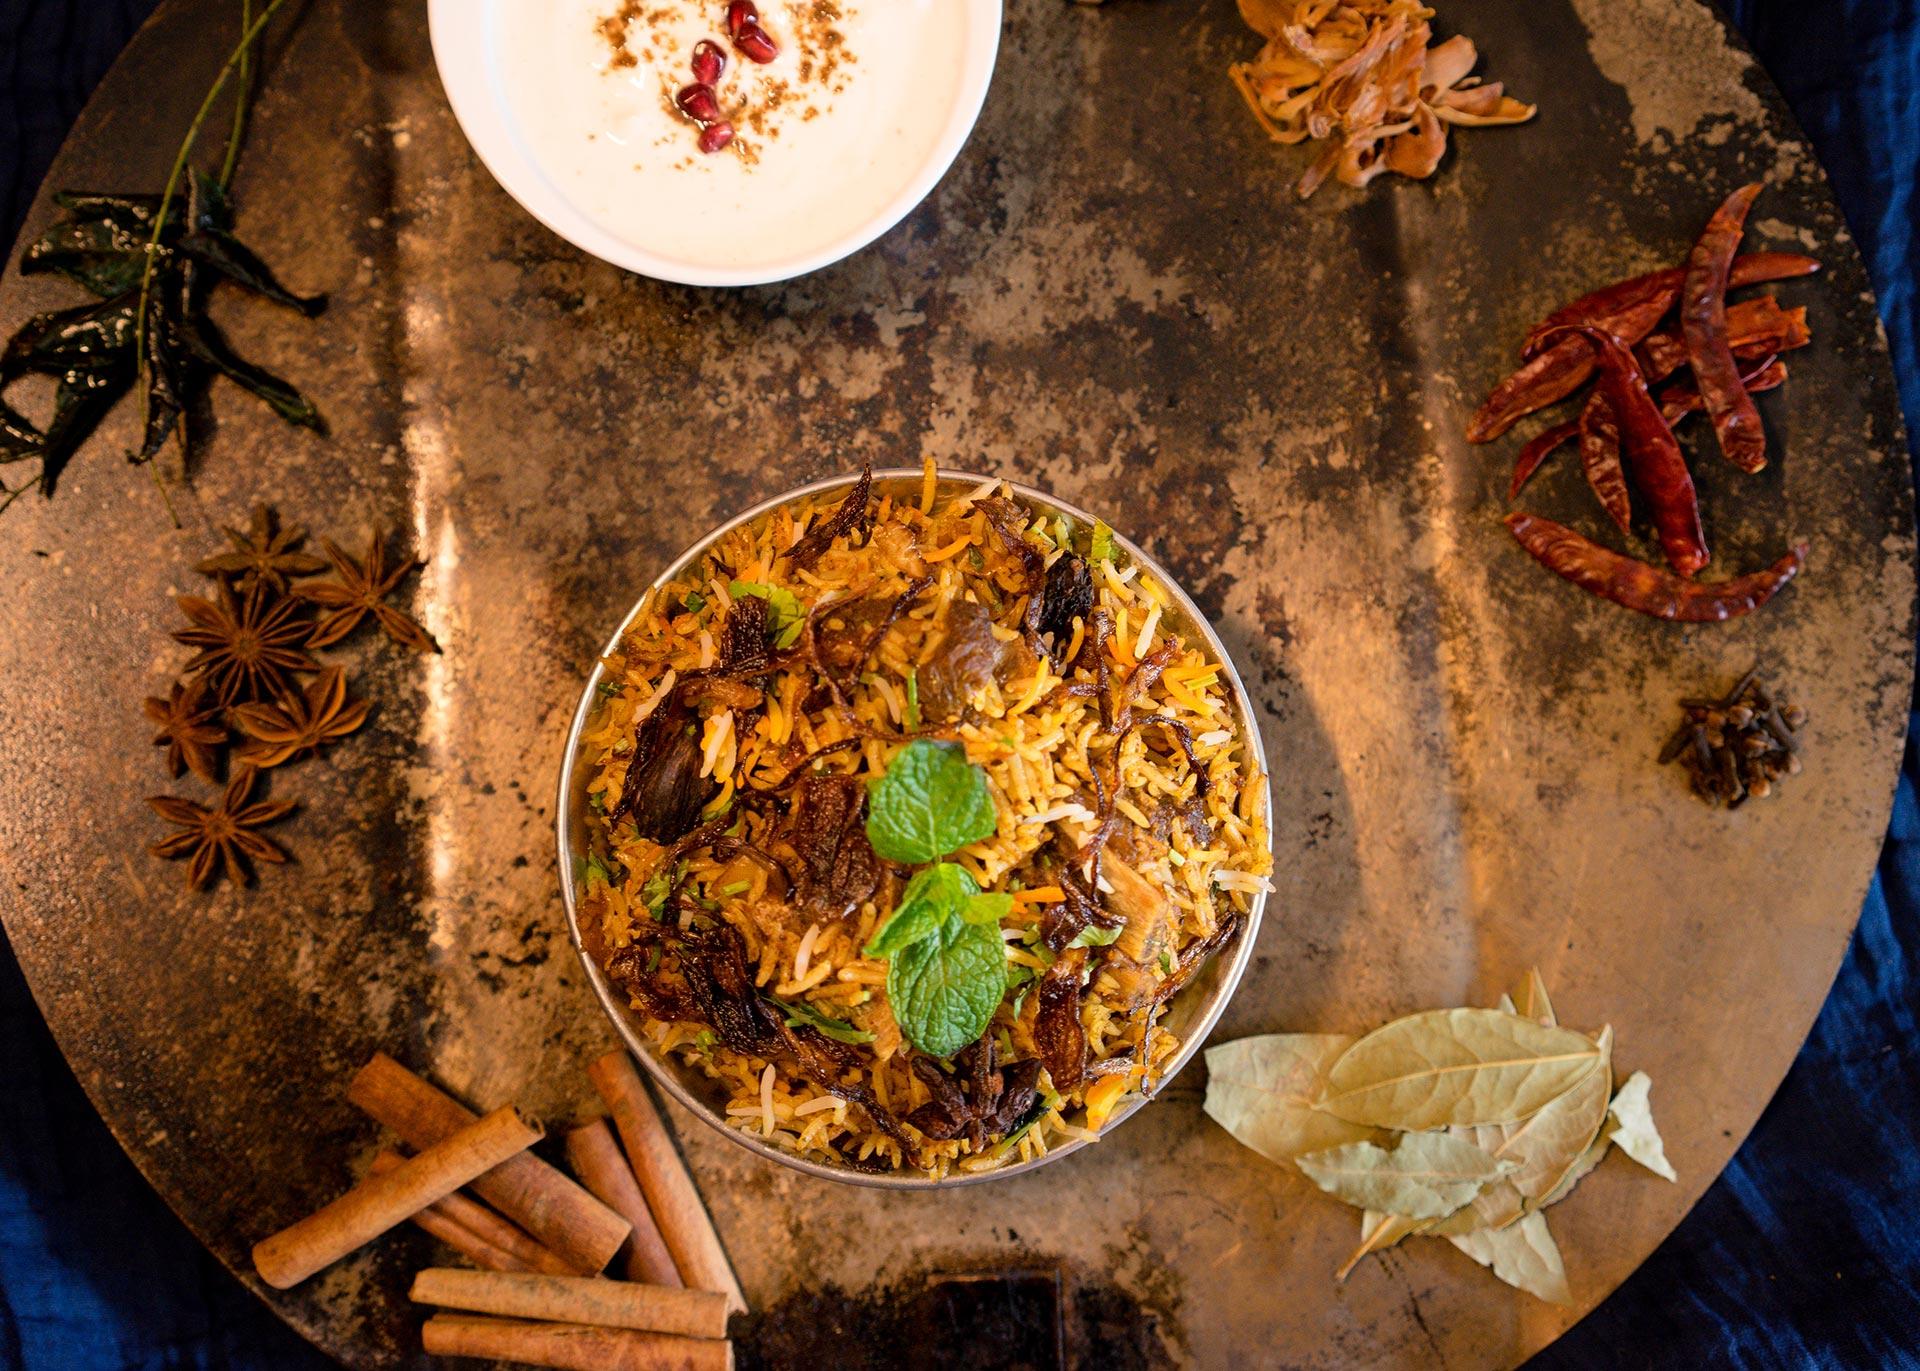 keeva-sf-restaurant-food-photographer-a-few-good-clicks-55.jpg